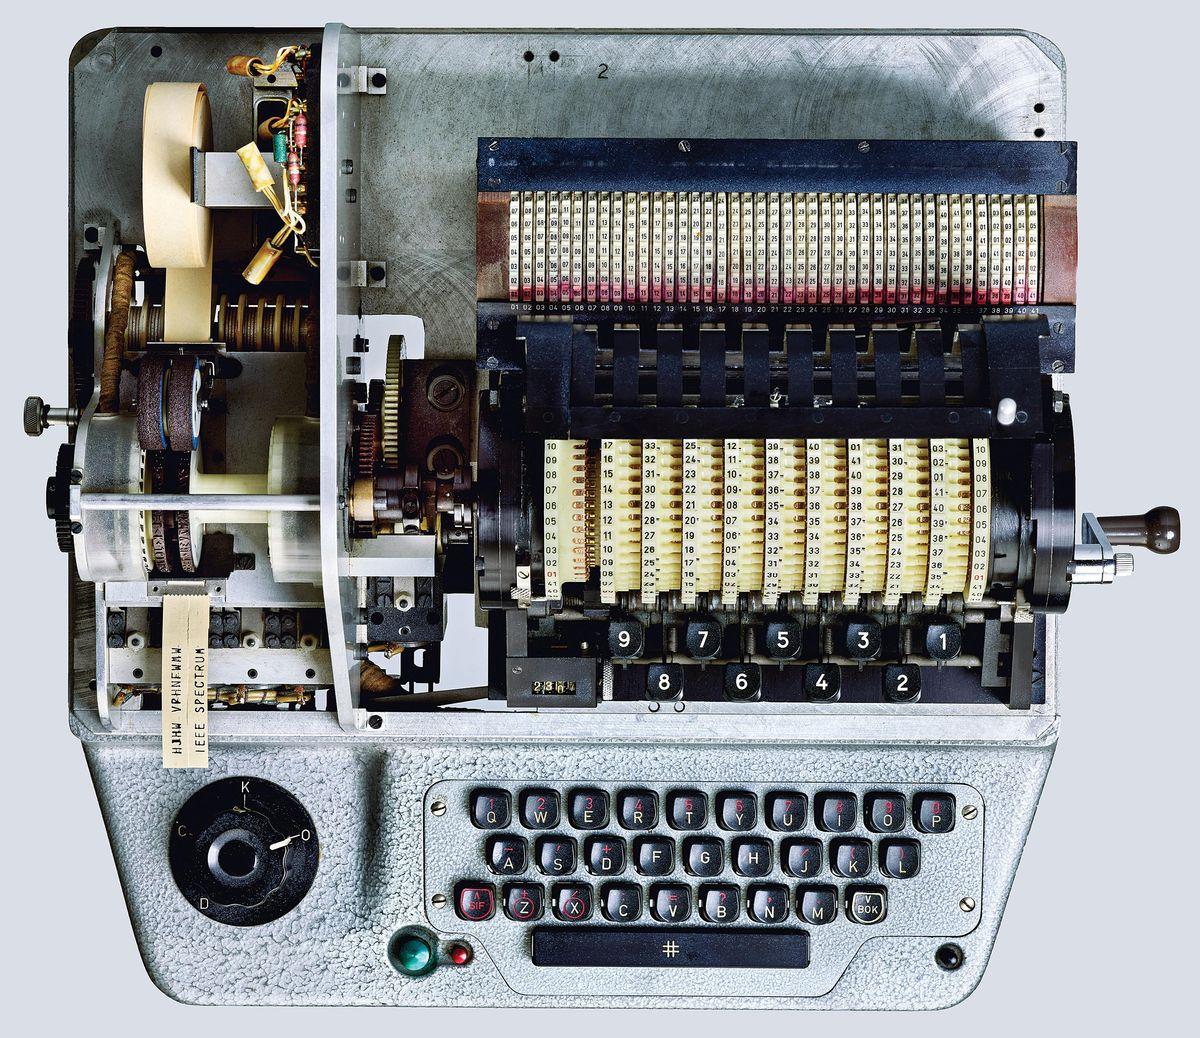 The HX-63 cipher machine